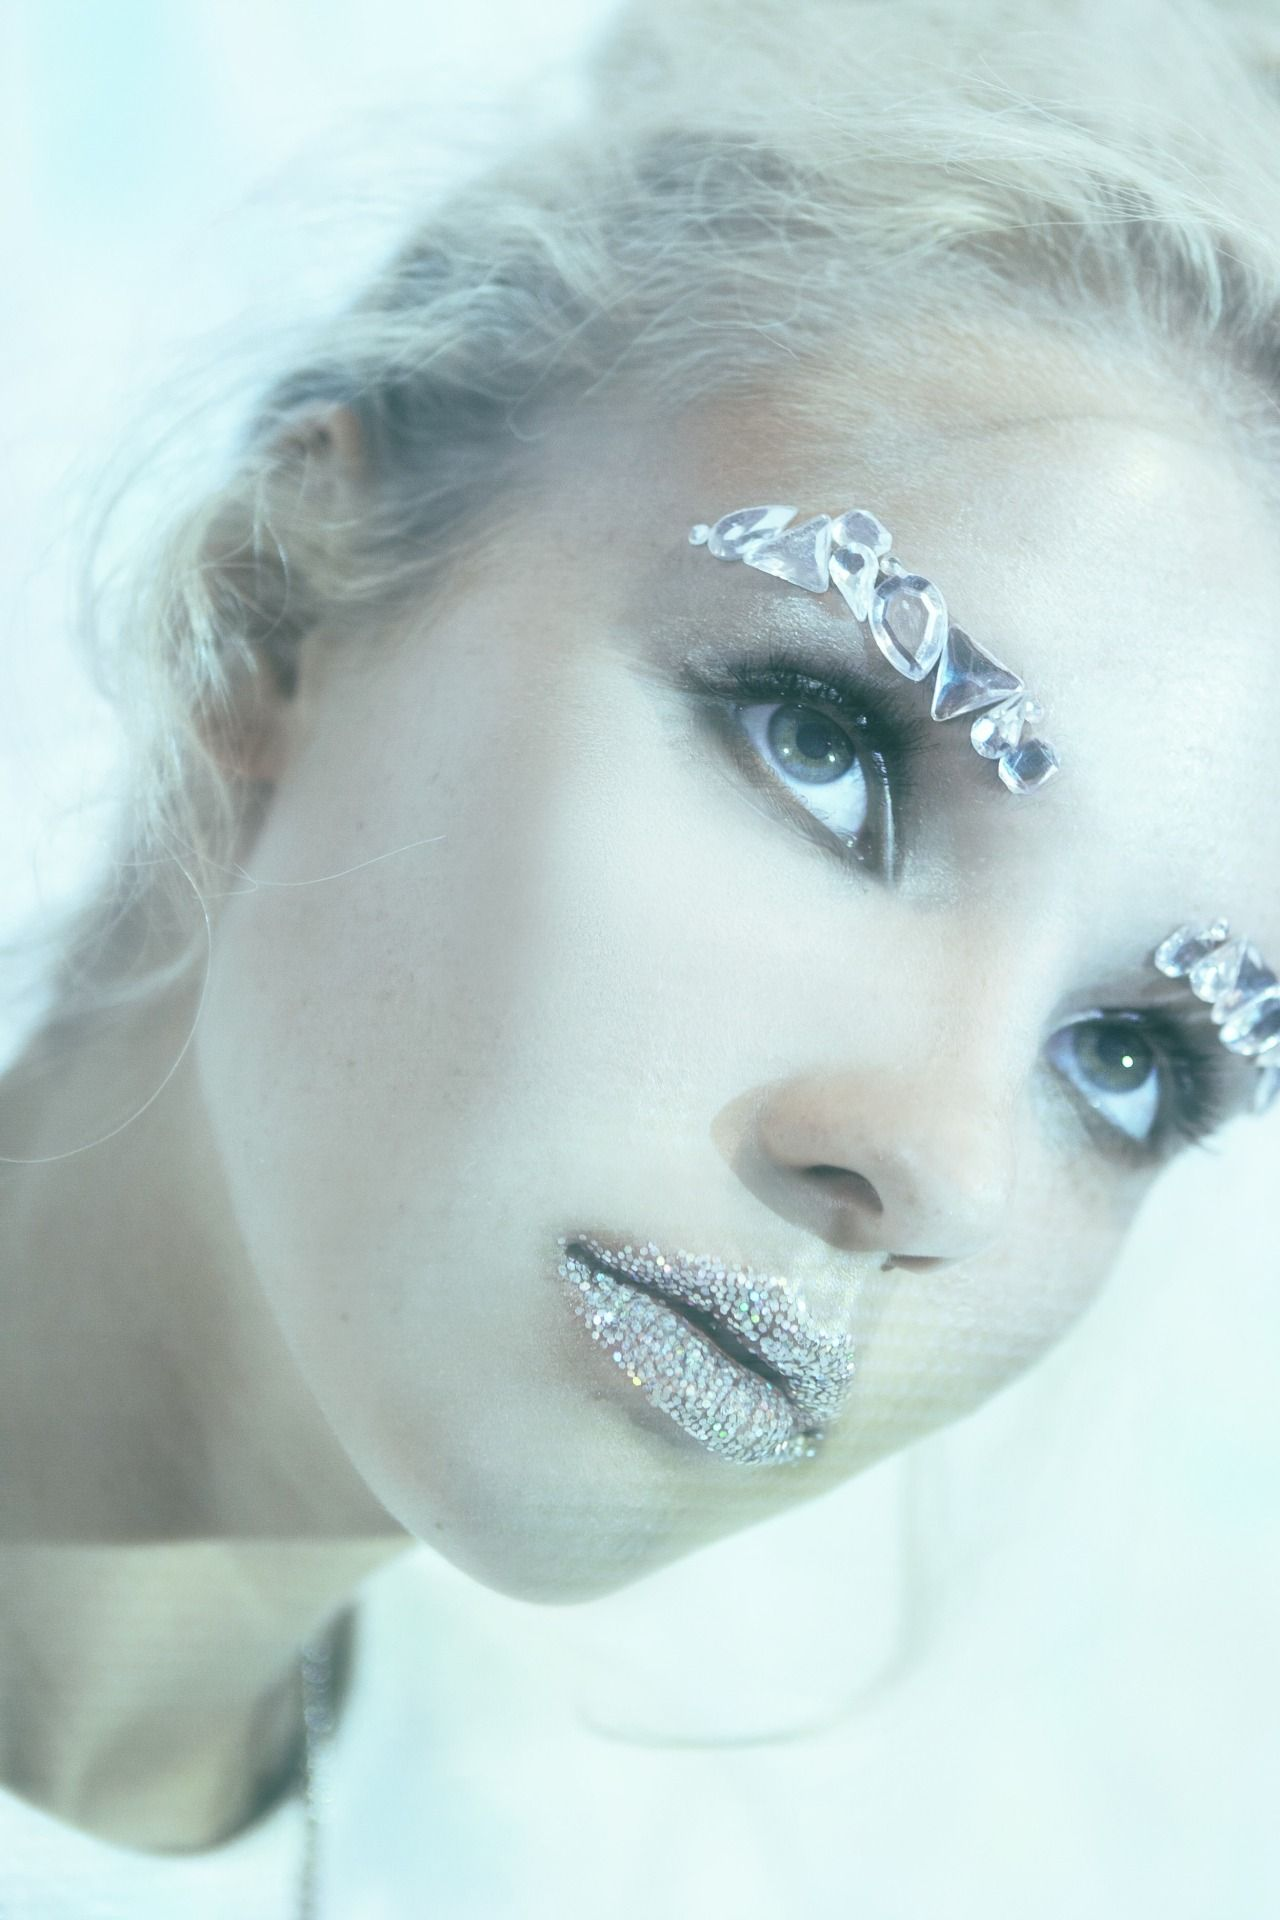 Rachel Yampolsky by TK Anderson